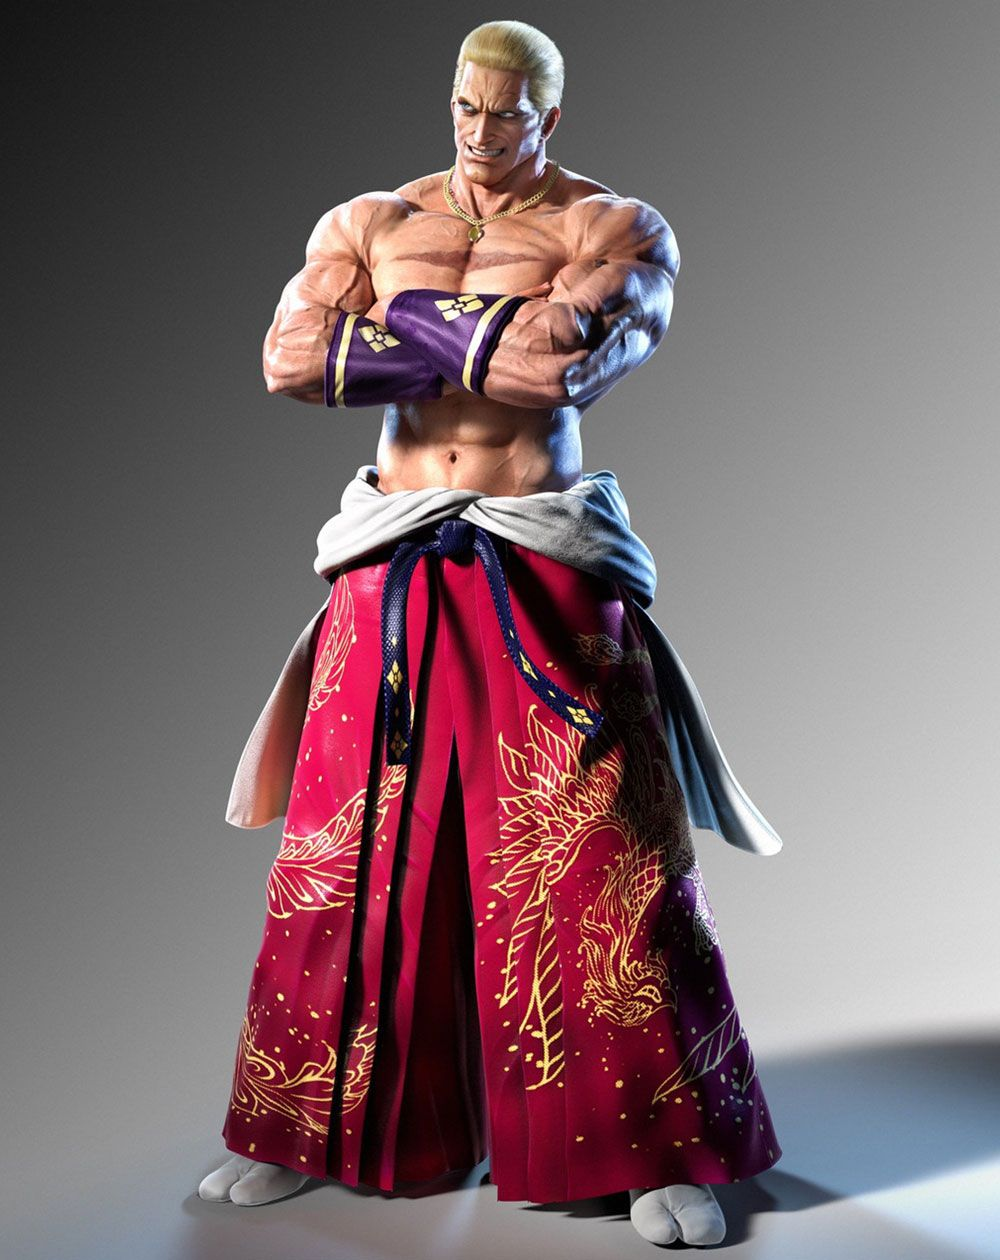 Geese Howard Character Artwork From Tekken 7 Fated Retribution